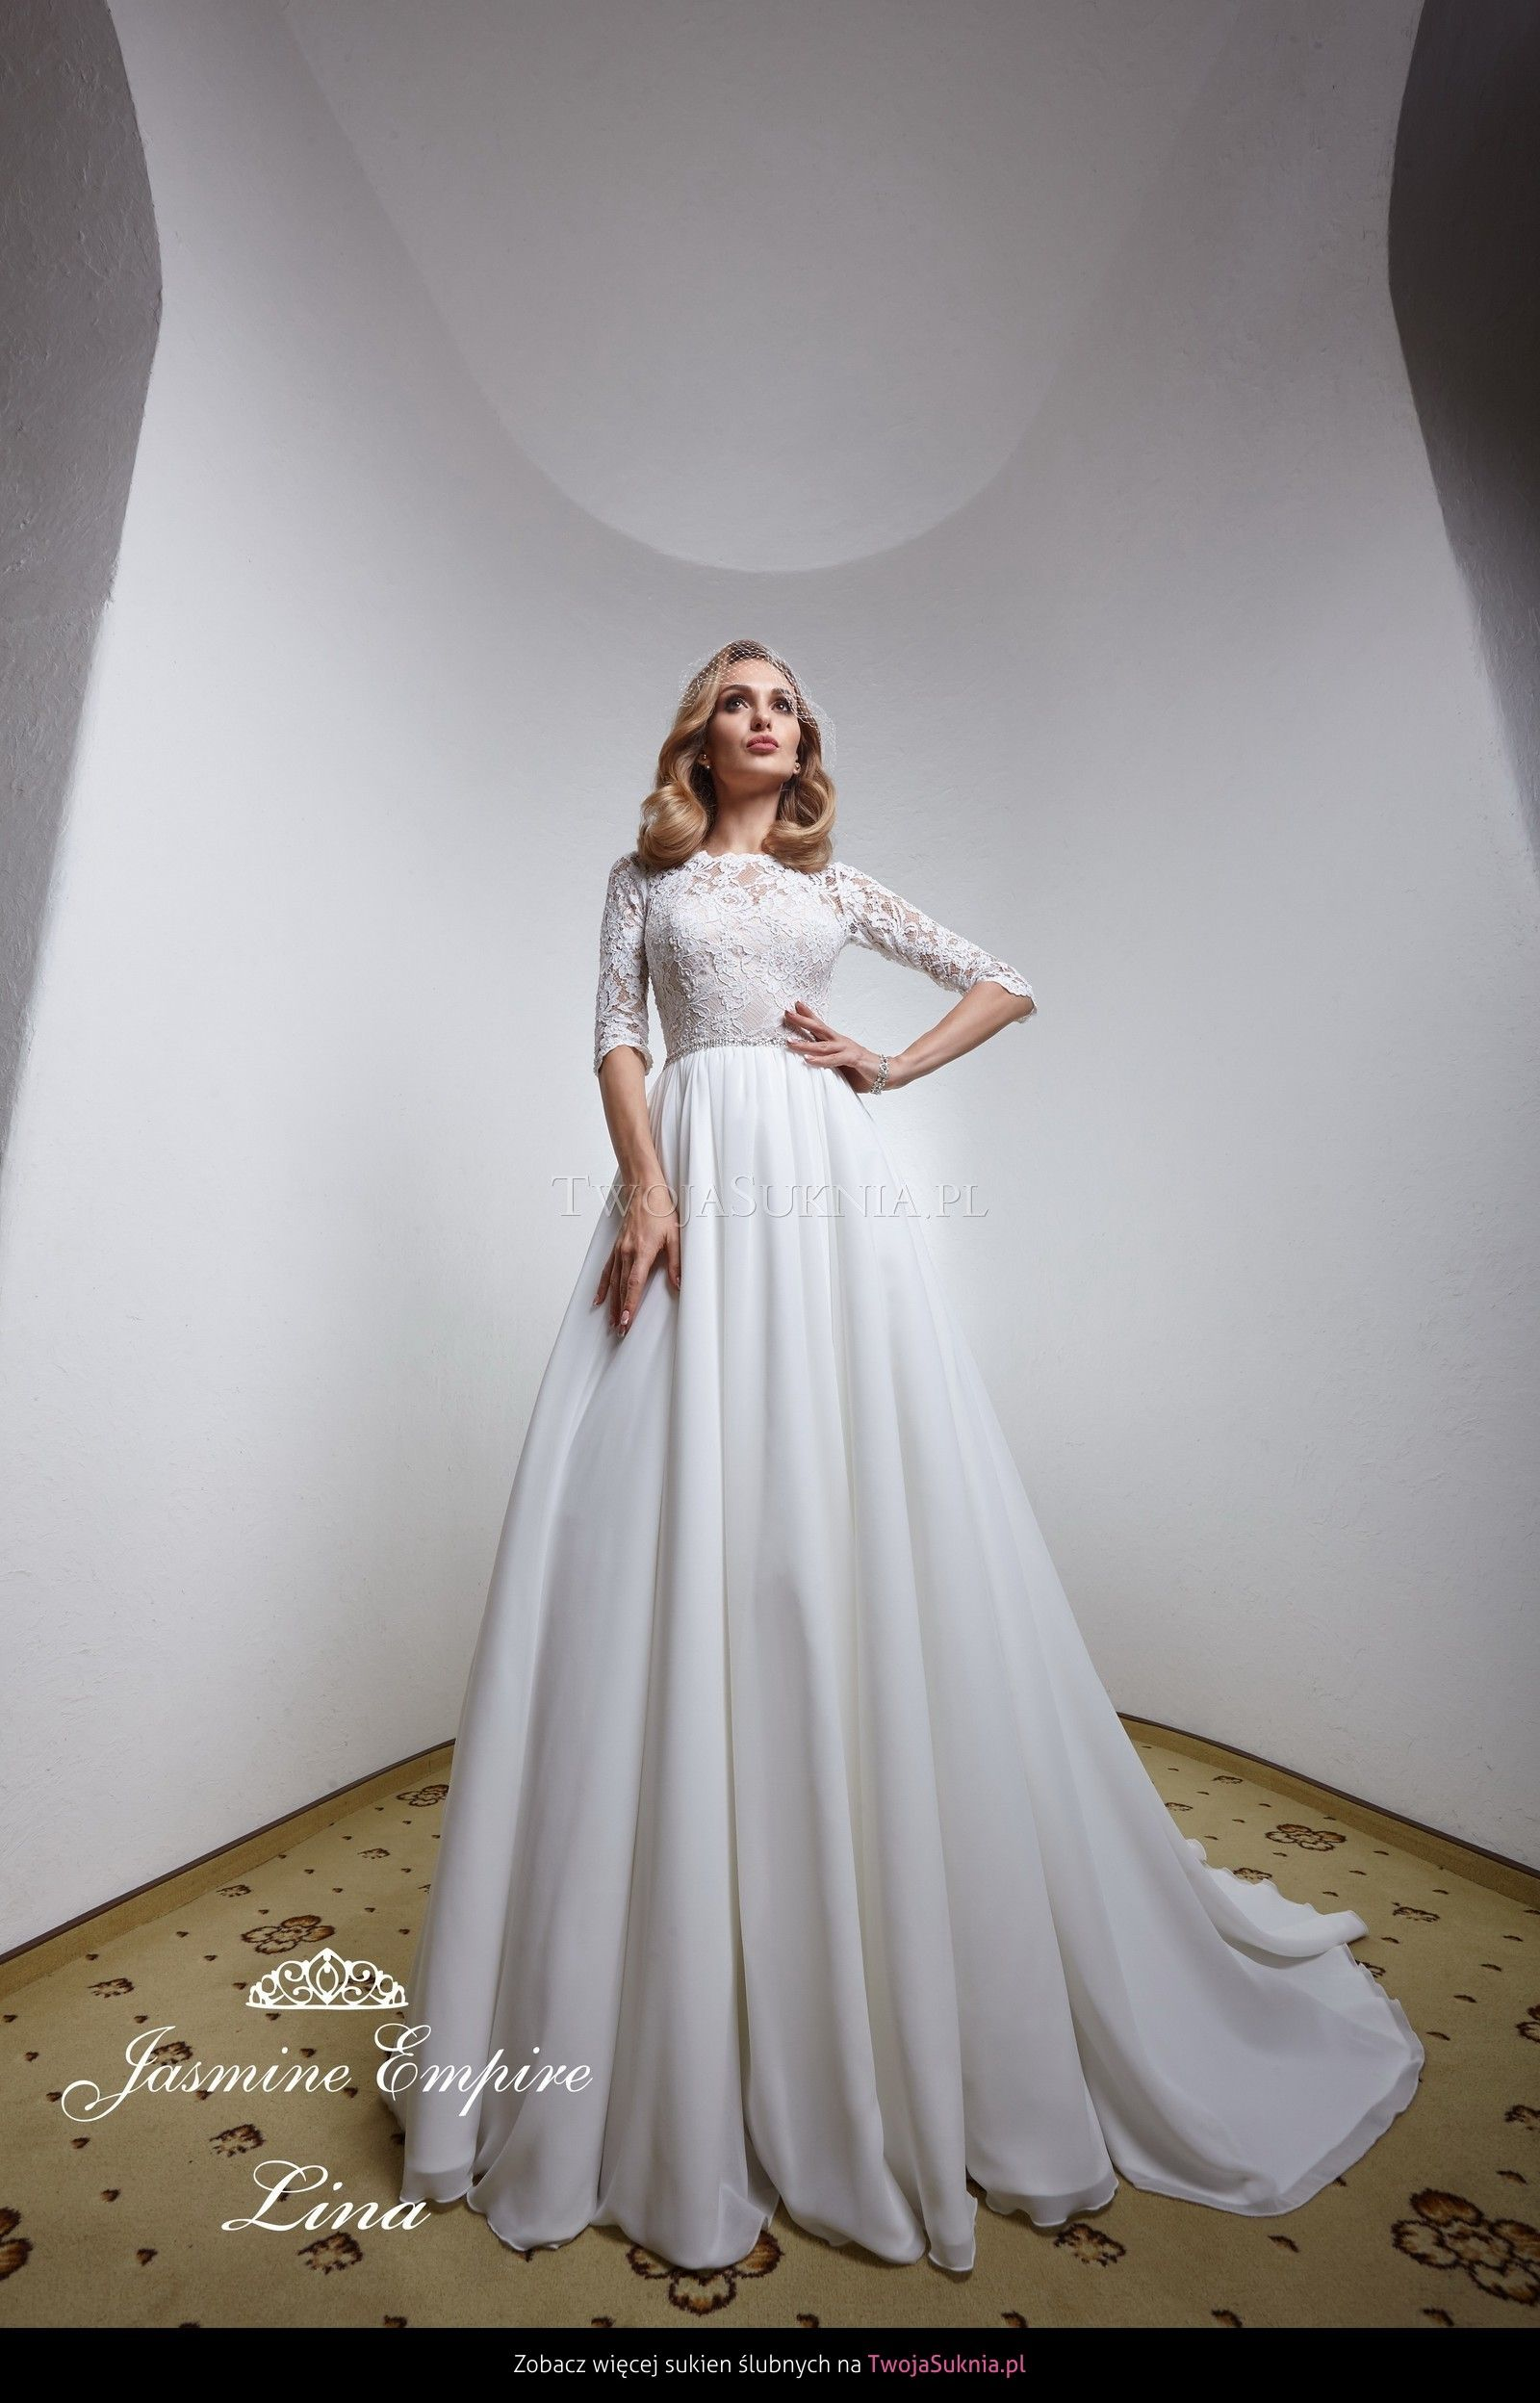 Jasmine Empire Lina Obsession Empire Wedding Dress Wedding Dresses Sleeveless Wedding Dress